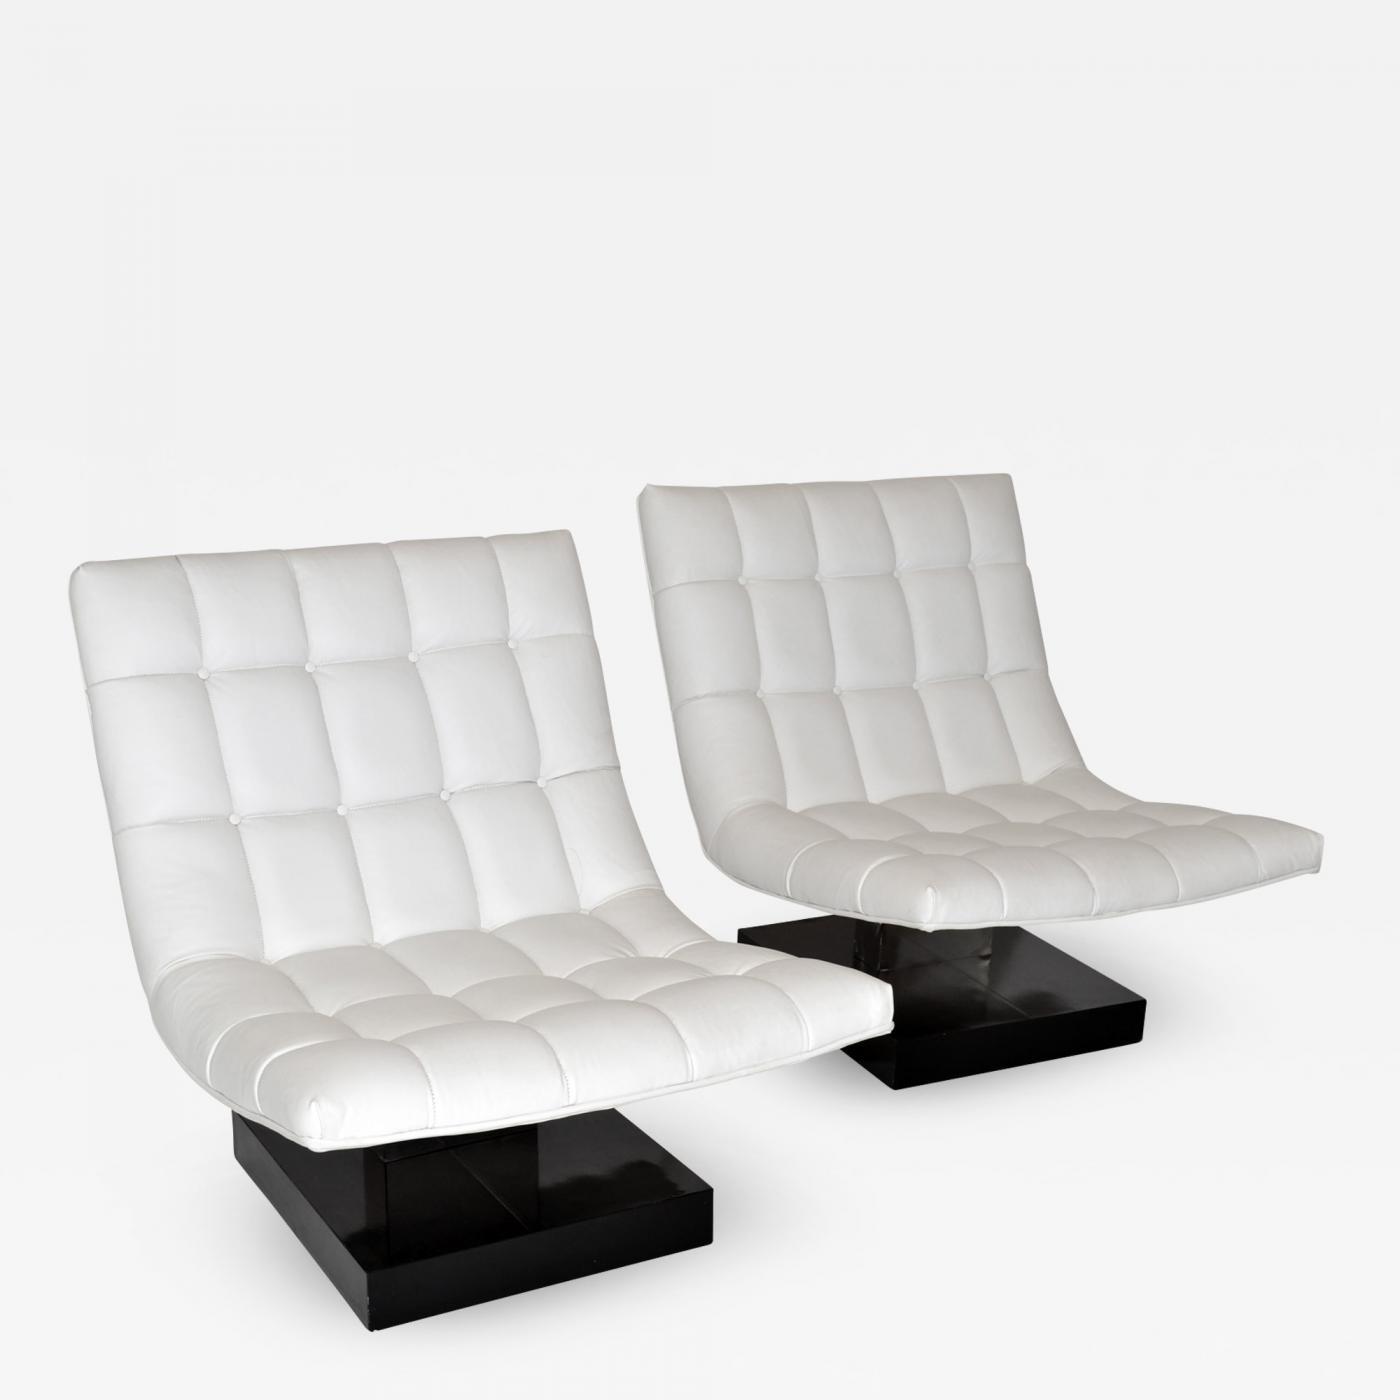 Marvelous Milo Baughman Pair Of Milo Baughman Leather Scoop Lounge Chairs For Thayer Coggin 1980S Uwap Interior Chair Design Uwaporg